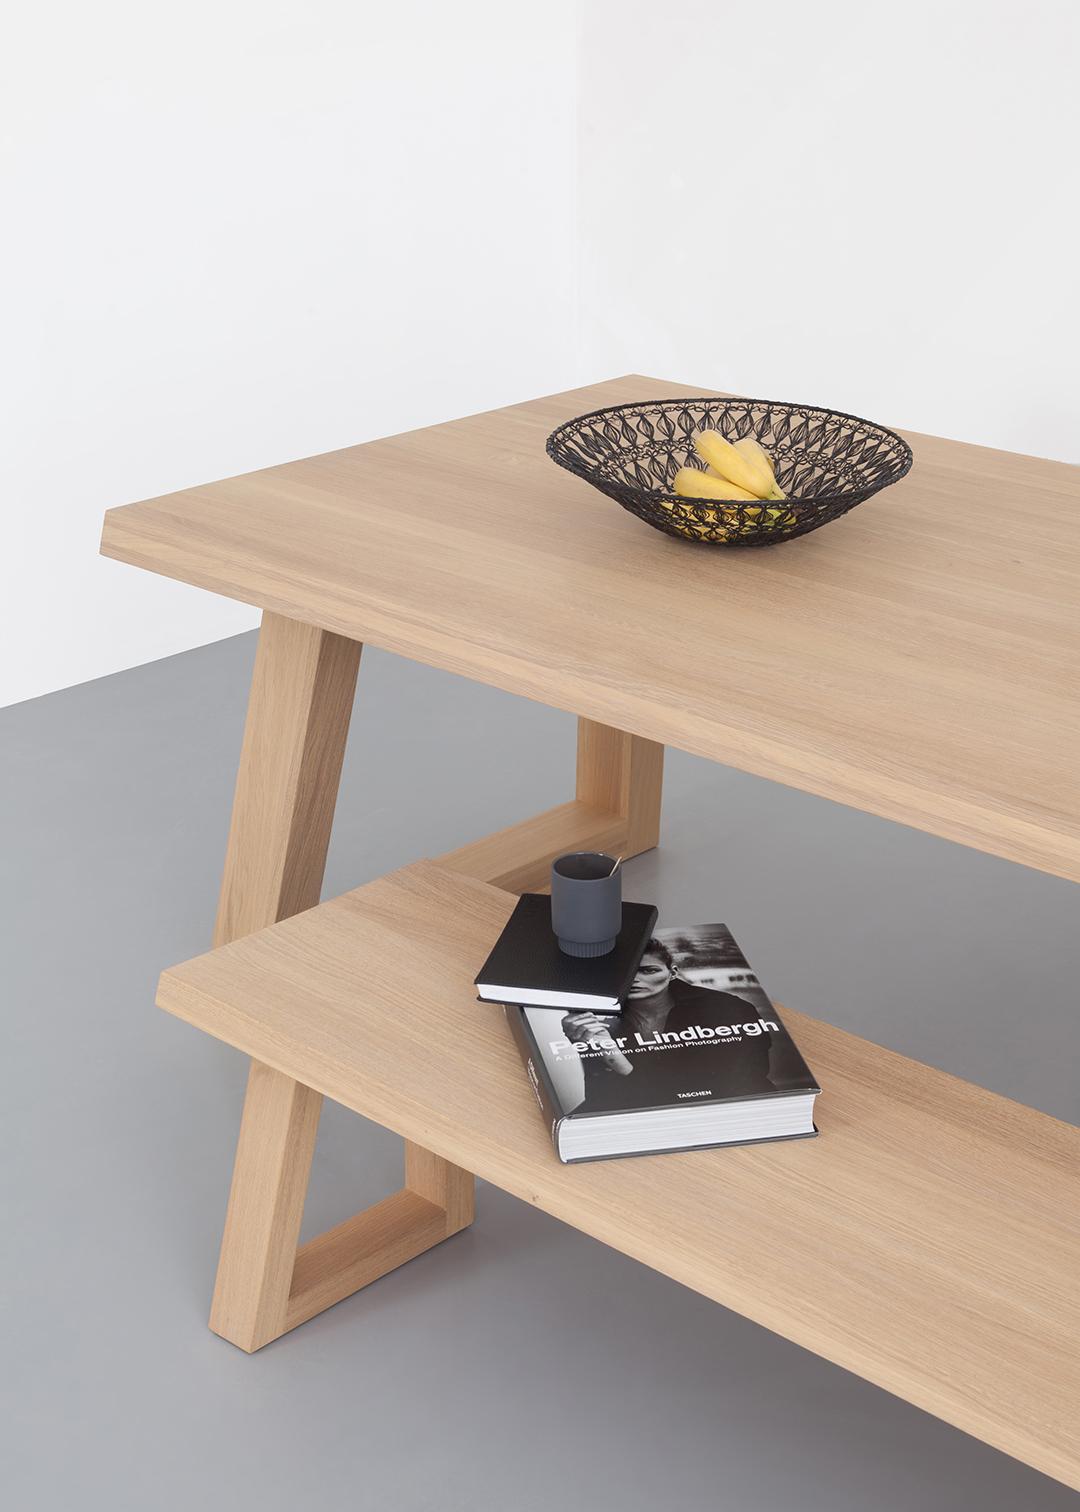 Design Eettafel Bank.Design Bench Slide L Remy Meijers L Odesi Your Dutch Design